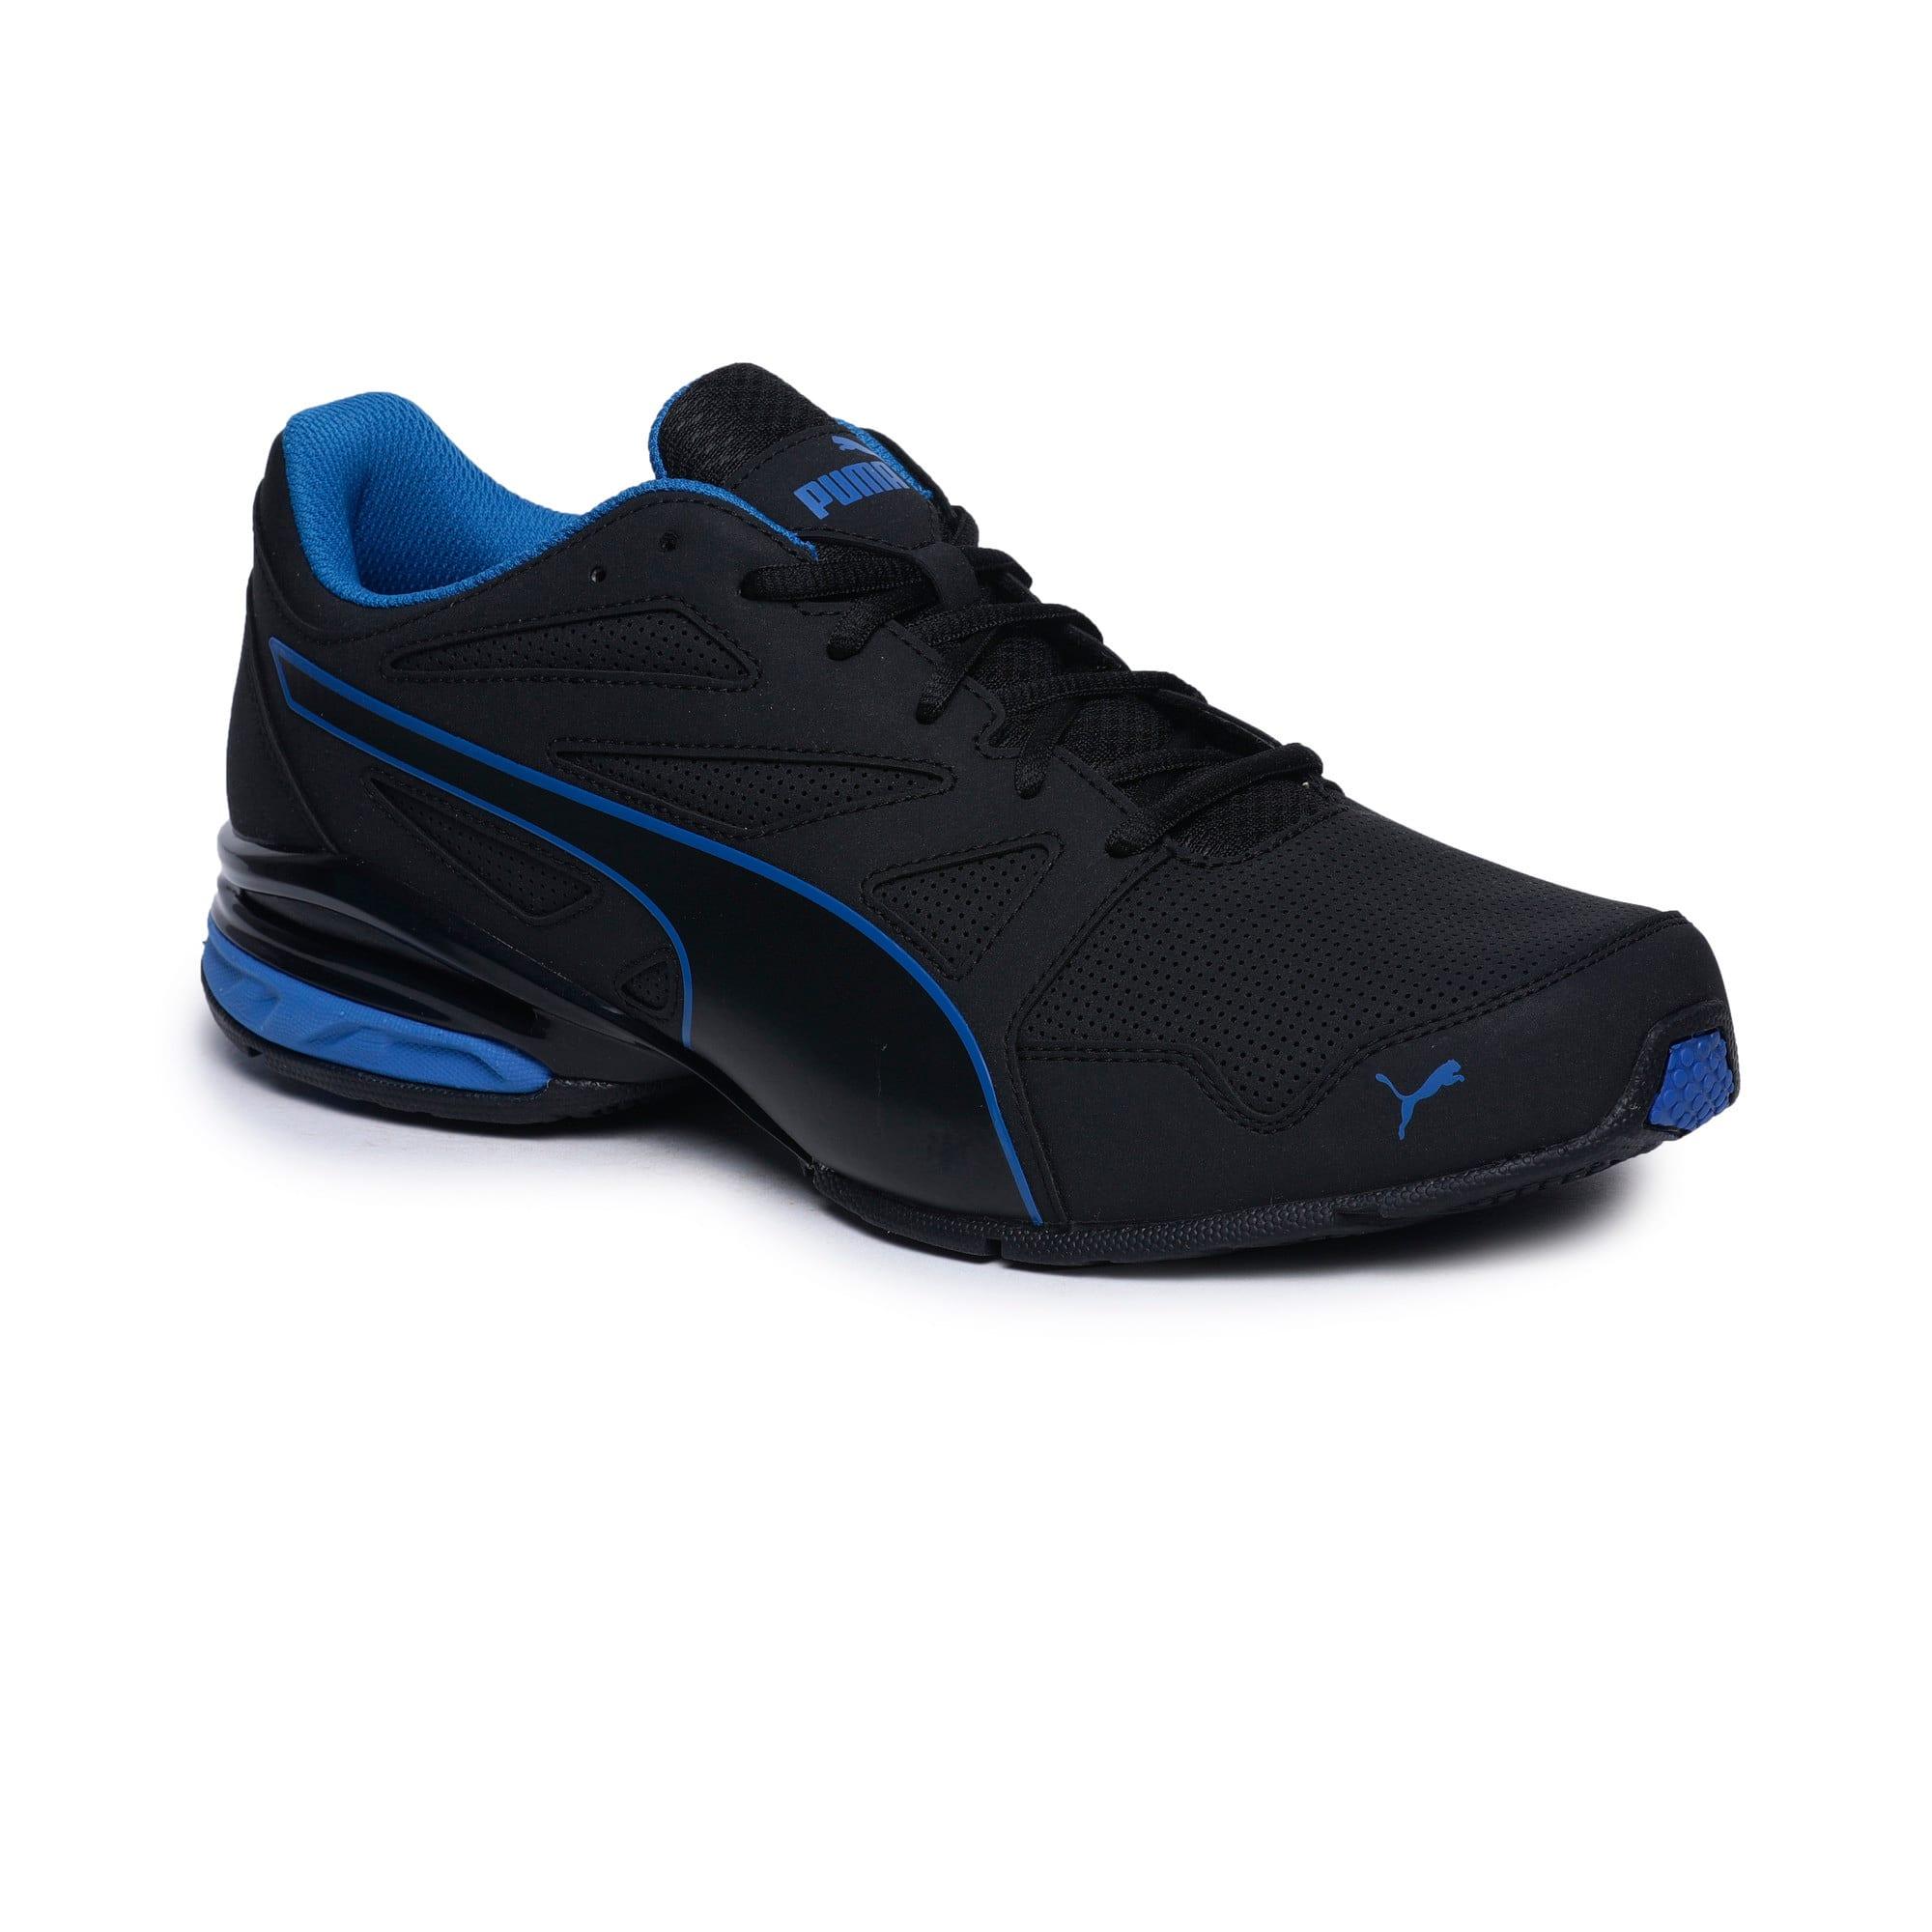 Thumbnail 1 of Tazon Modern SL Men's Running Shoes, Puma Black-Lapis Blue, medium-IND